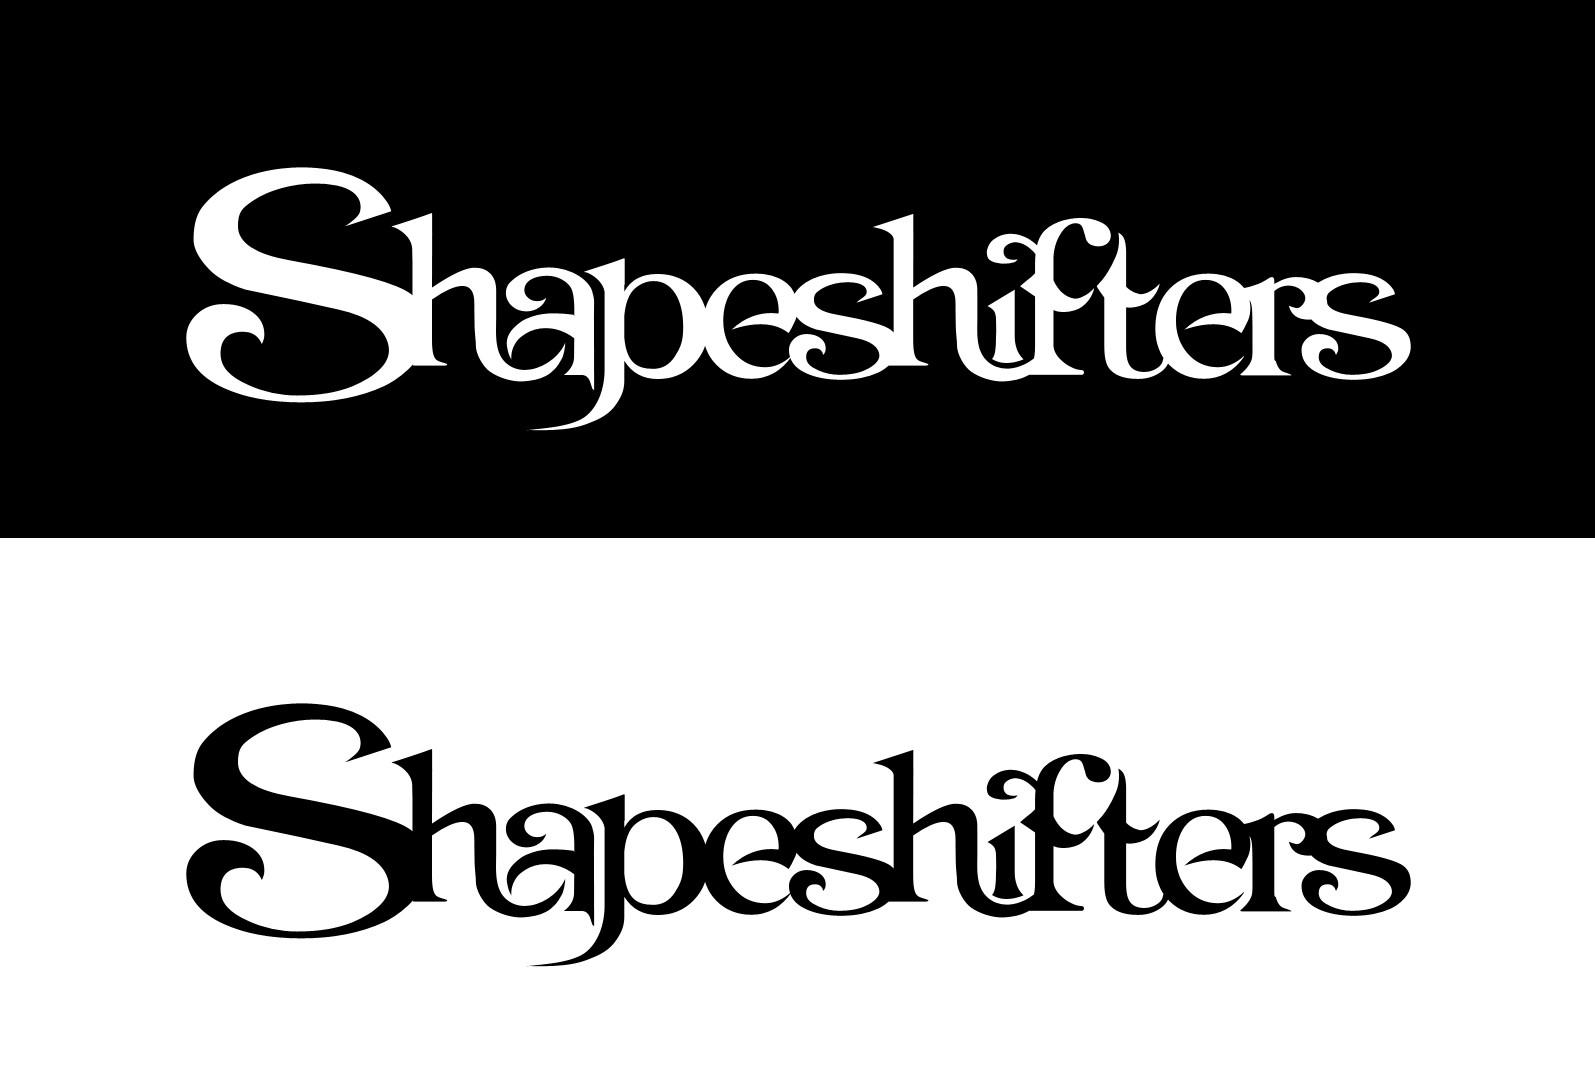 Jeff christy logotype shapeshifters simple